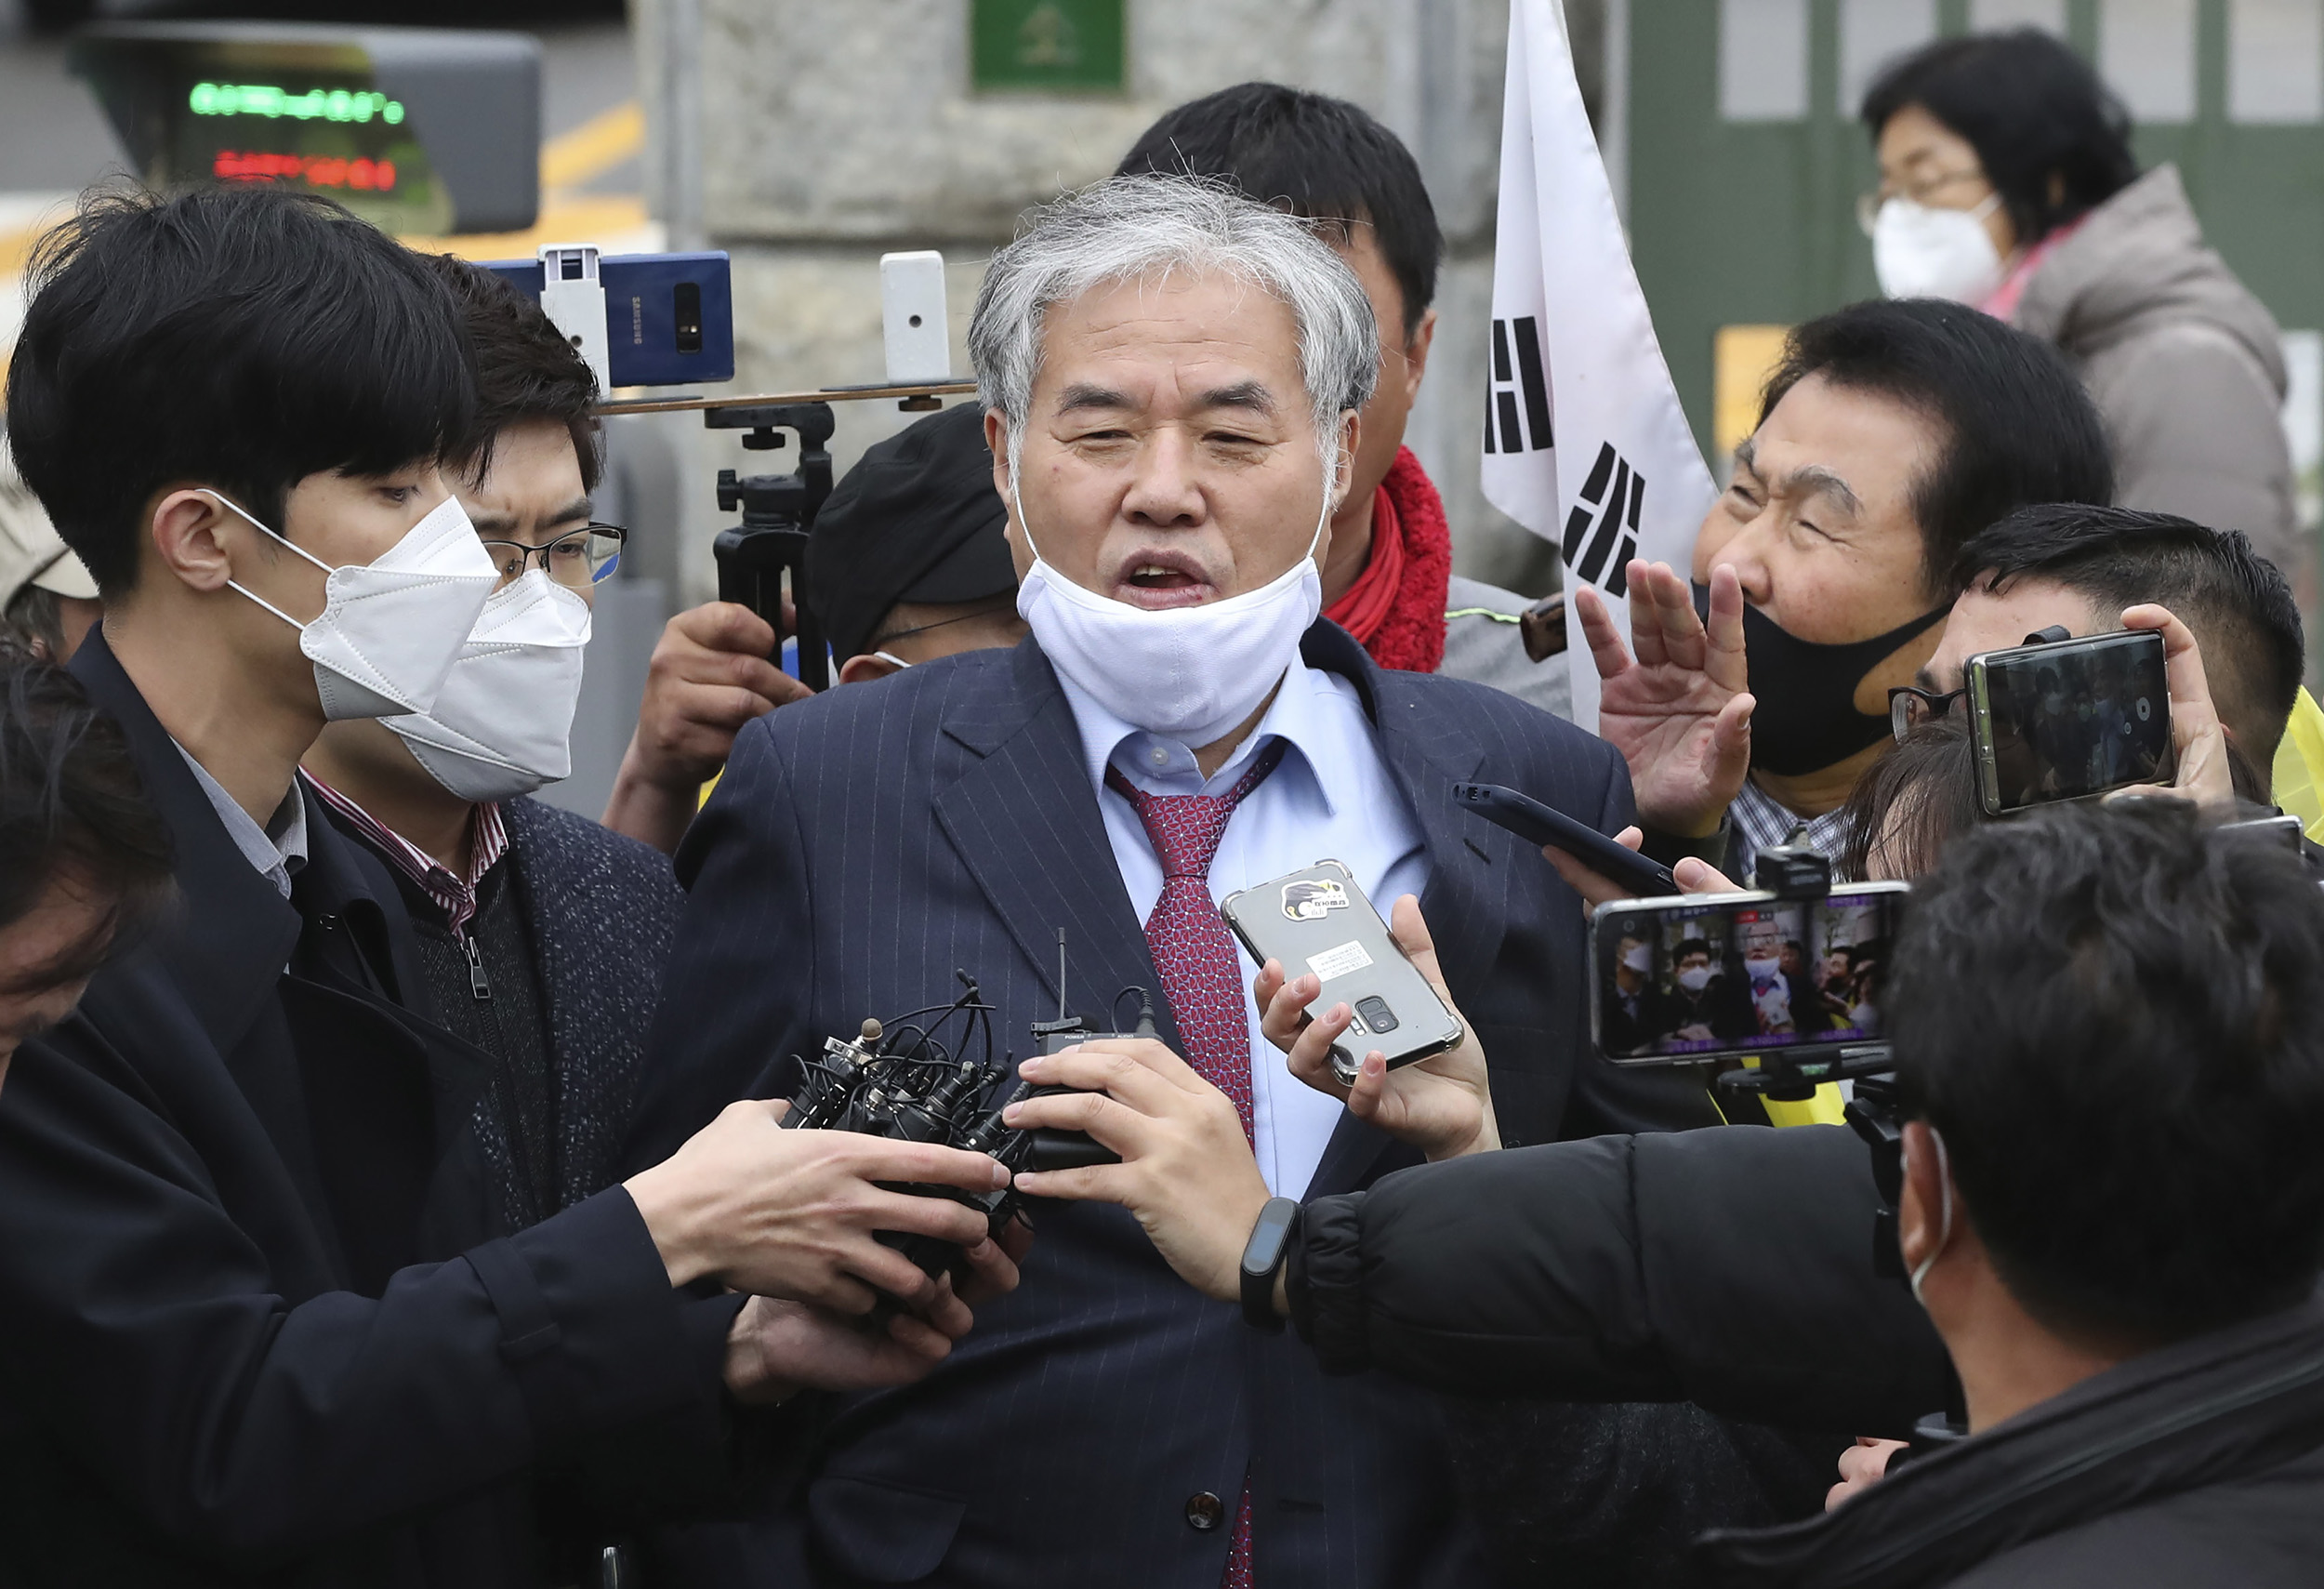 Sarang-jeil Church pastor Jun Kwang-hoon speaks outside a detention center in Uiwang, South Korea, on April 20.